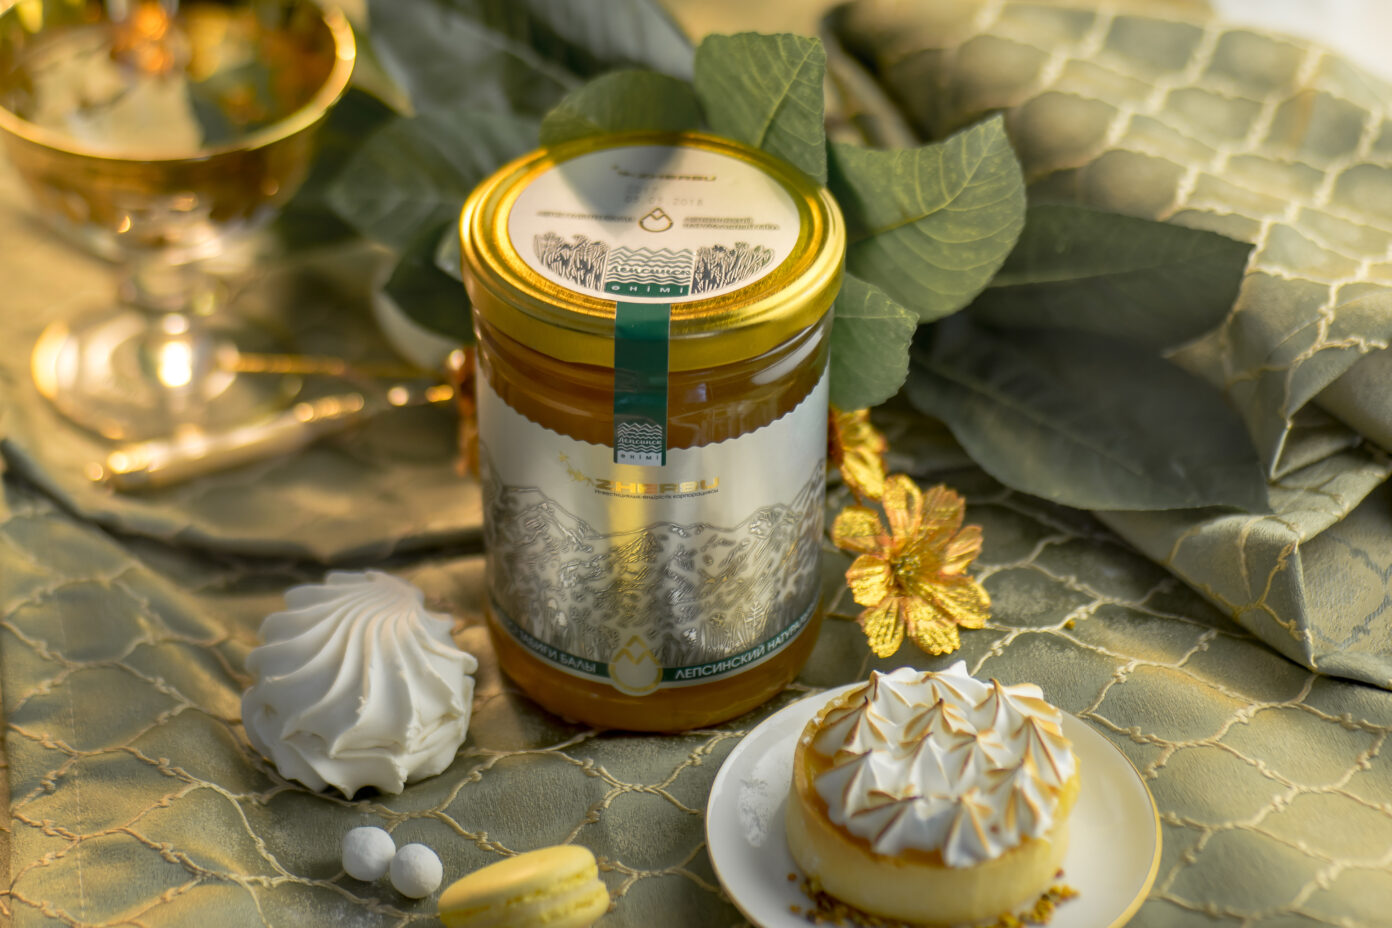 Liquid Gold of Lepsinsk